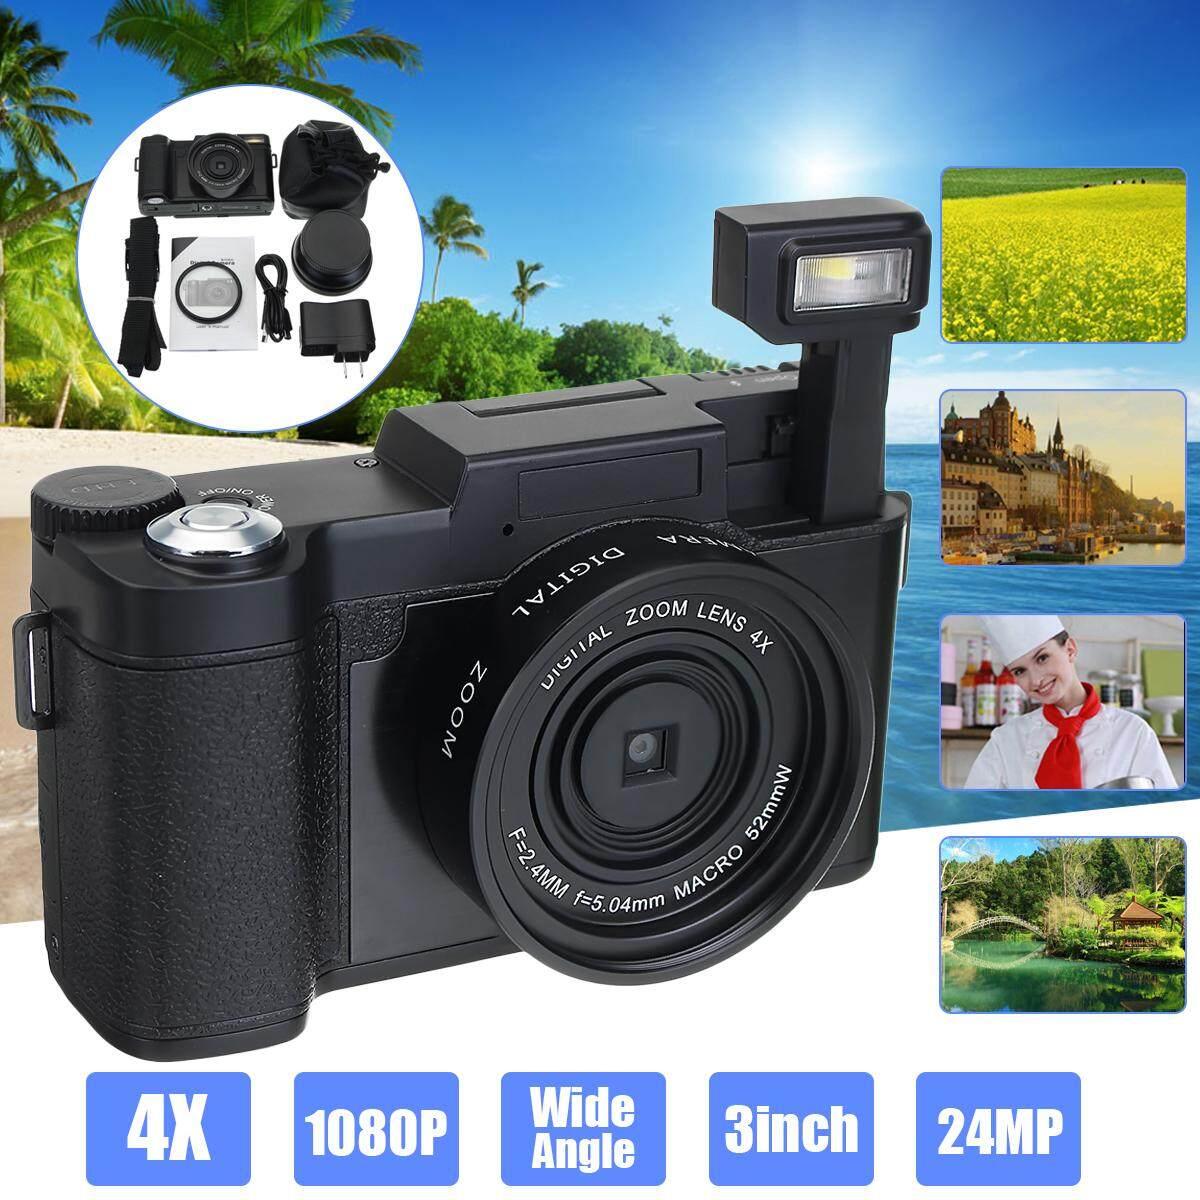 G36 Digital Kamera HD Penuh 1080 P Video Camcorder Kamera Vlogging-Intl